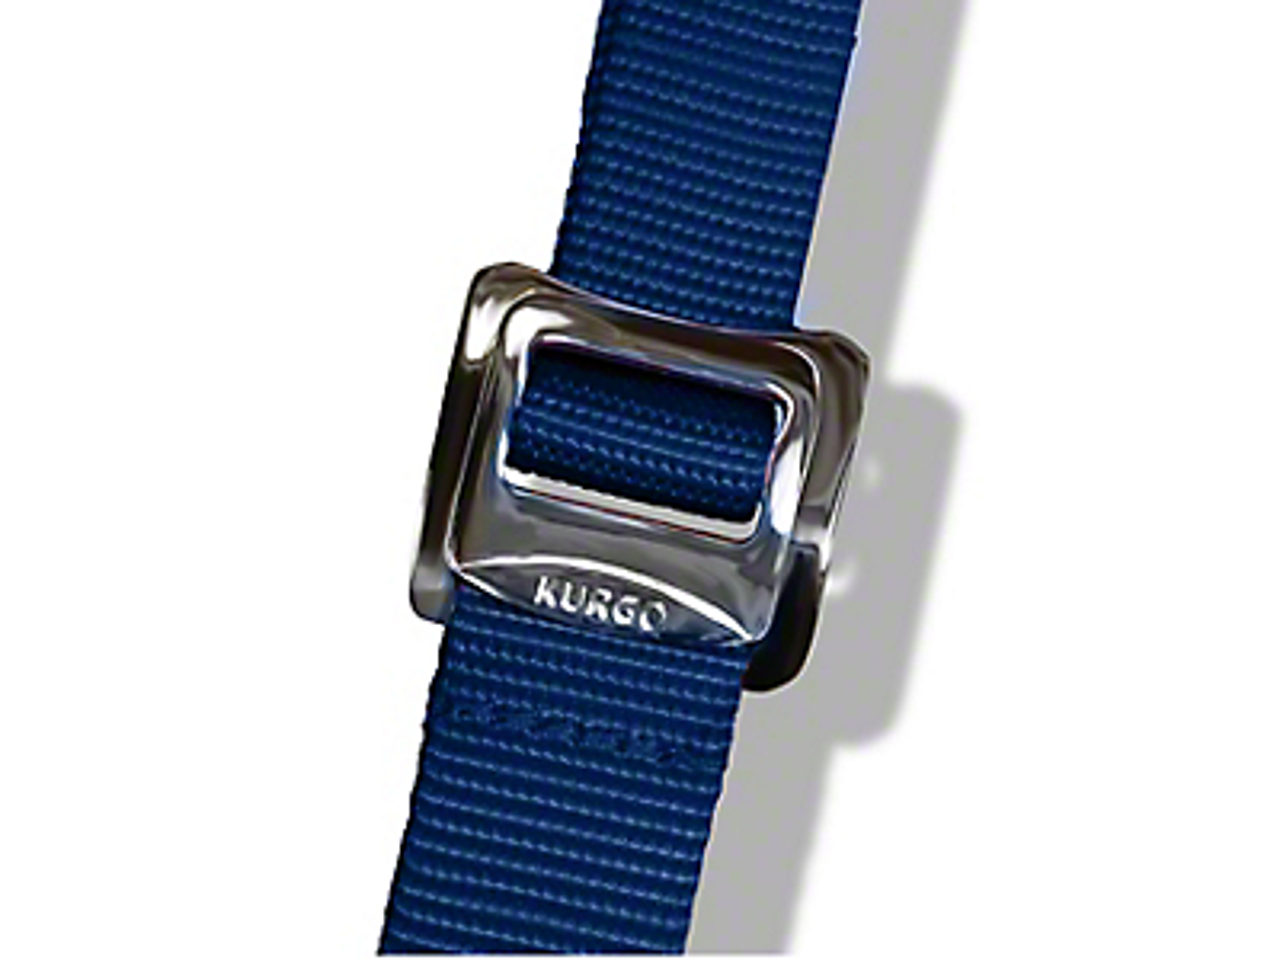 Kurgo Go-Tech Adventure Dog Harness - Coastal Blue (07-18 Sierra 1500)